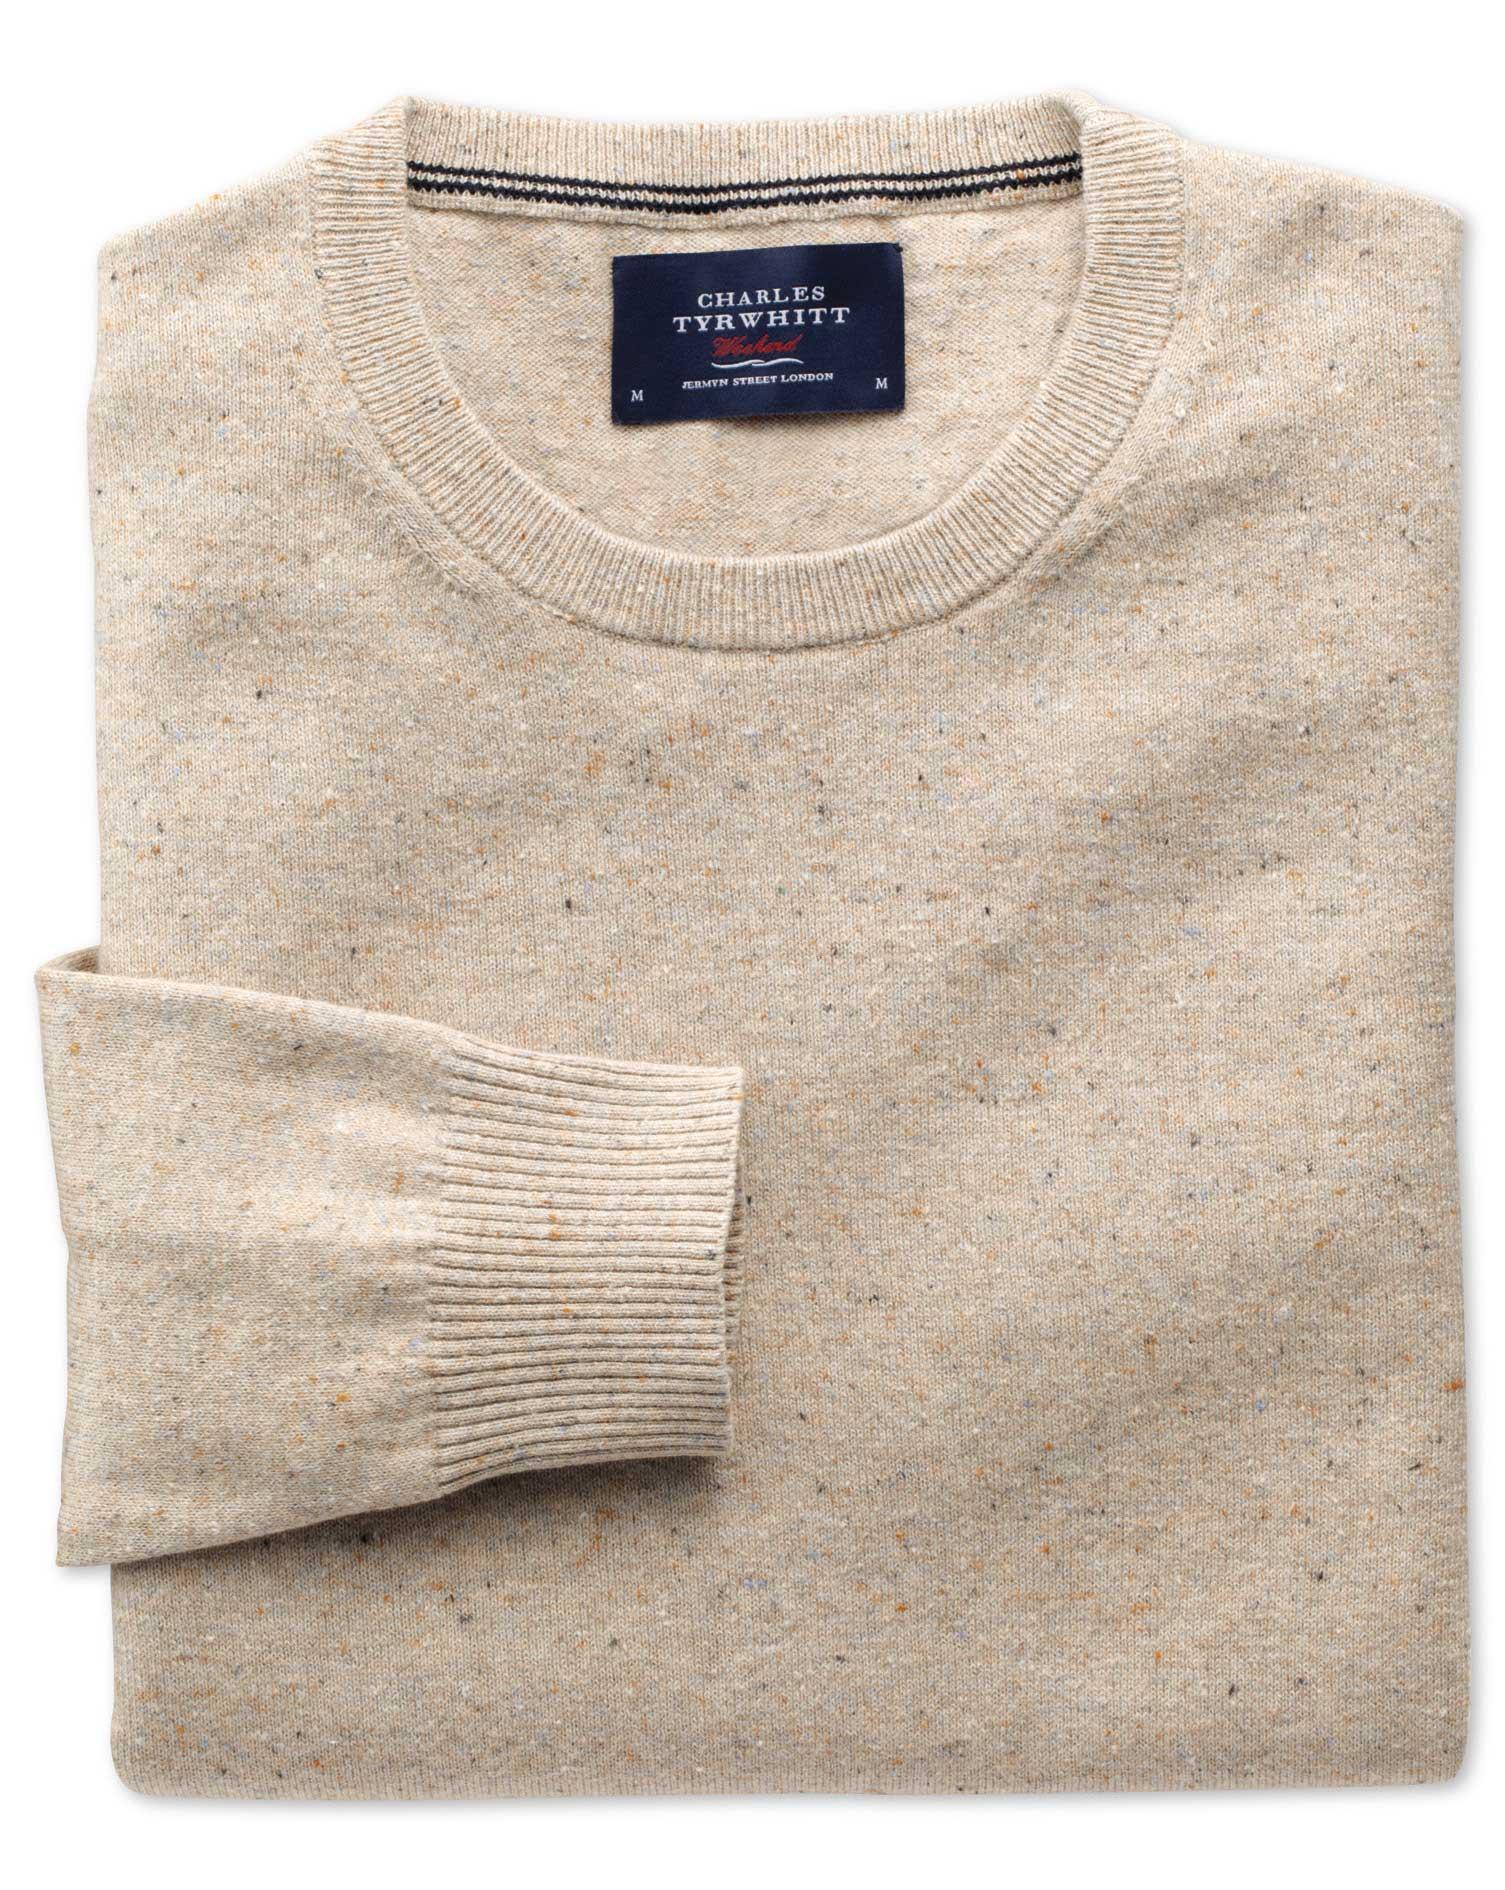 Stone Cotton Cashmere Crew Neck Jumper Size XXL by Charles Tyrwhitt